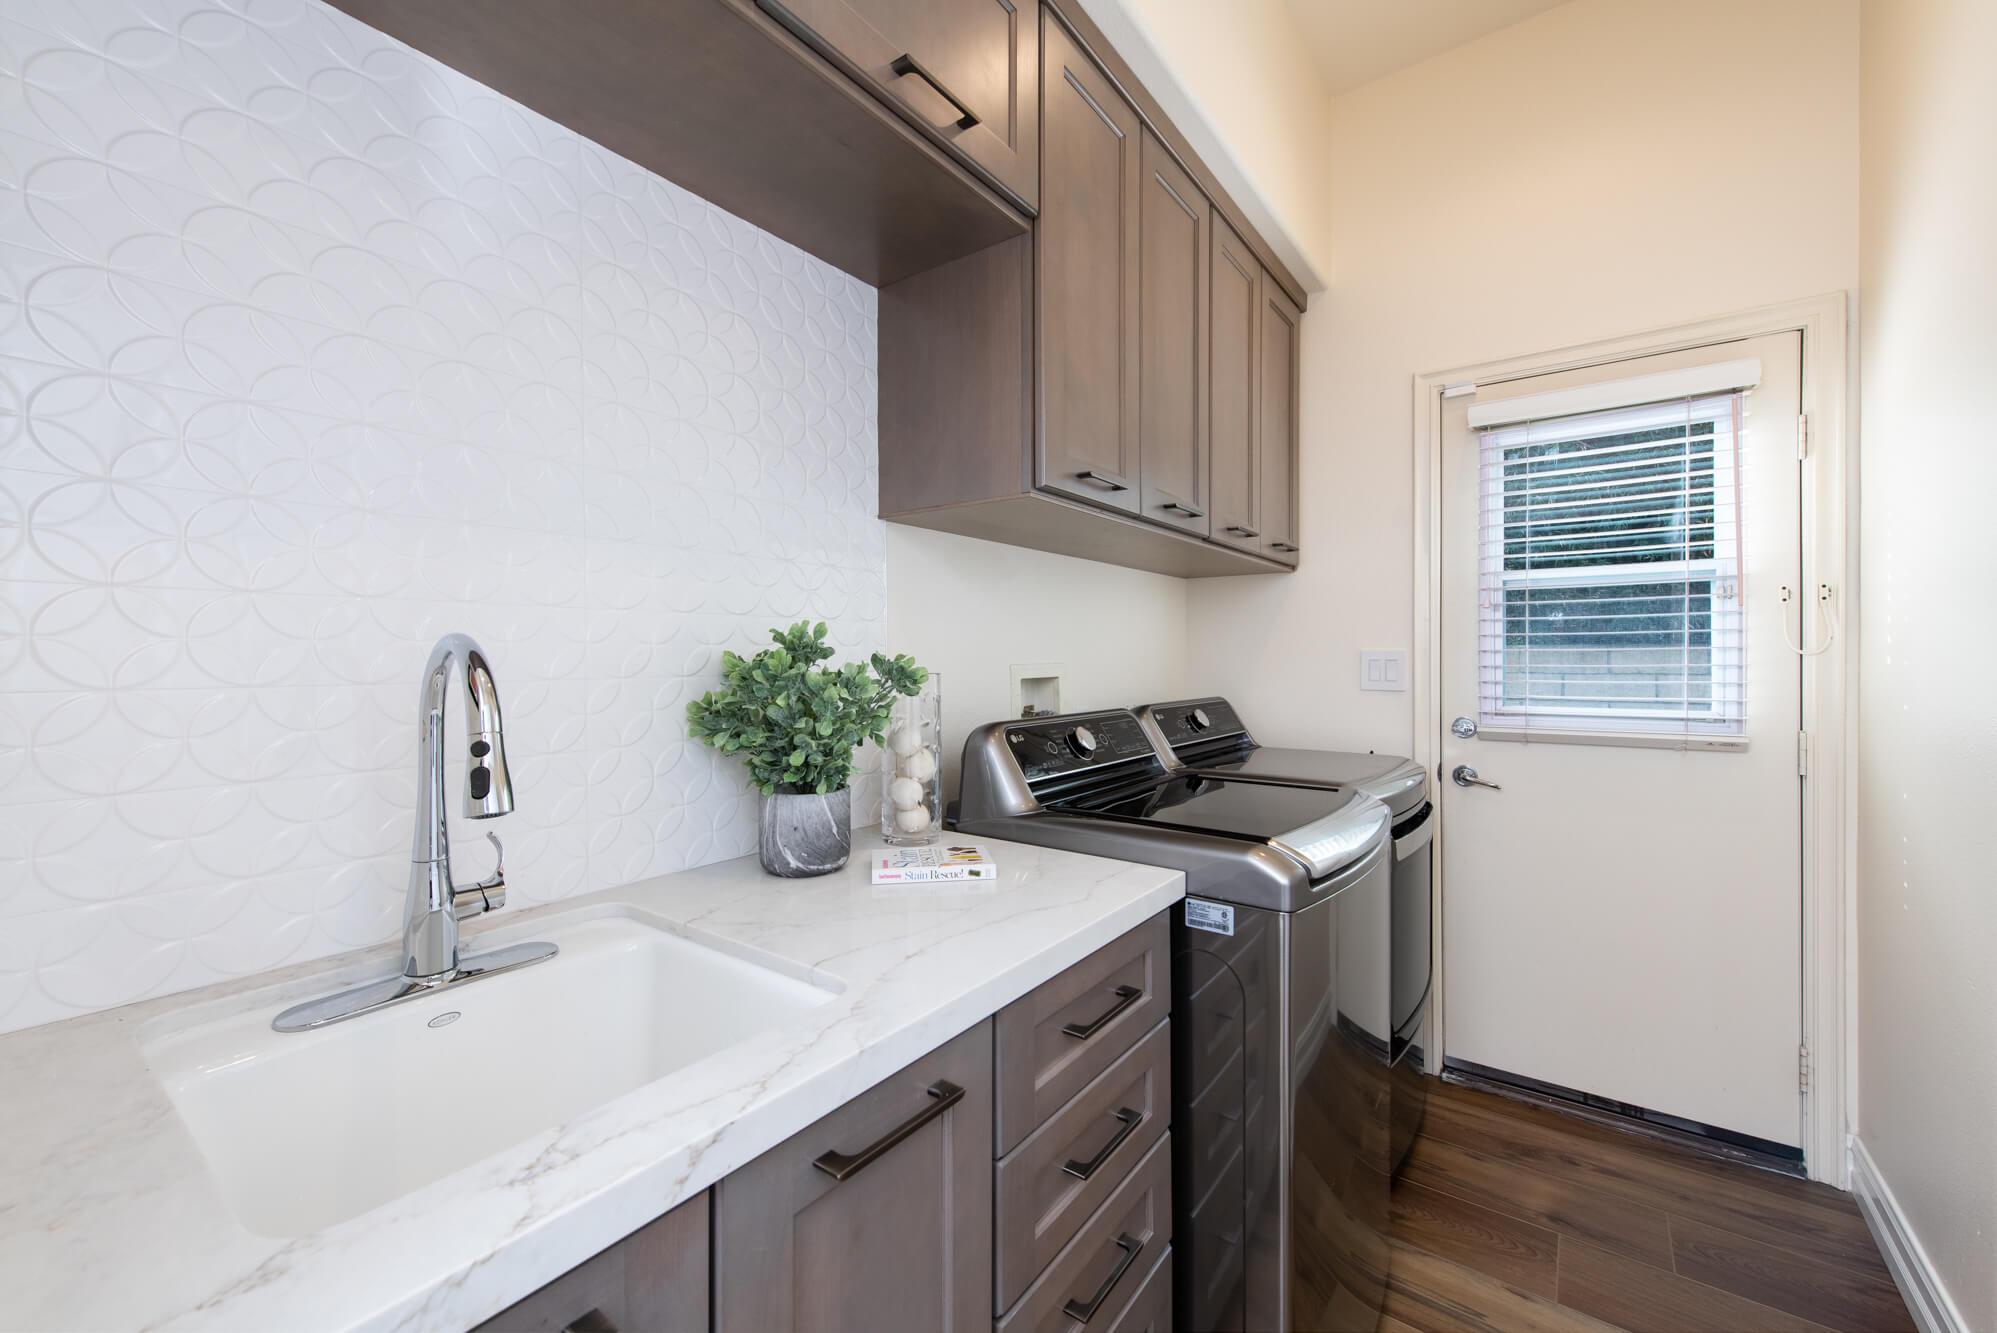 laundry-room-addition-ventilation